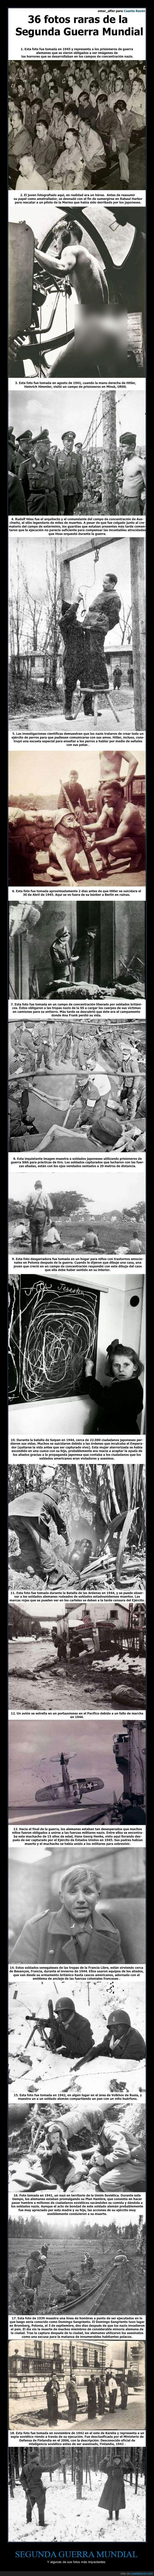 1945,alemania,cuerpo,curioso,fotos,guerra,Hitler,holocausto,impactante,inglaterra,judios,lo lamento si es muy largo,marina,nazi,niños,piloto,prisioneros,raro,rusia,segunda guerra mundial,urss,usa,wwii